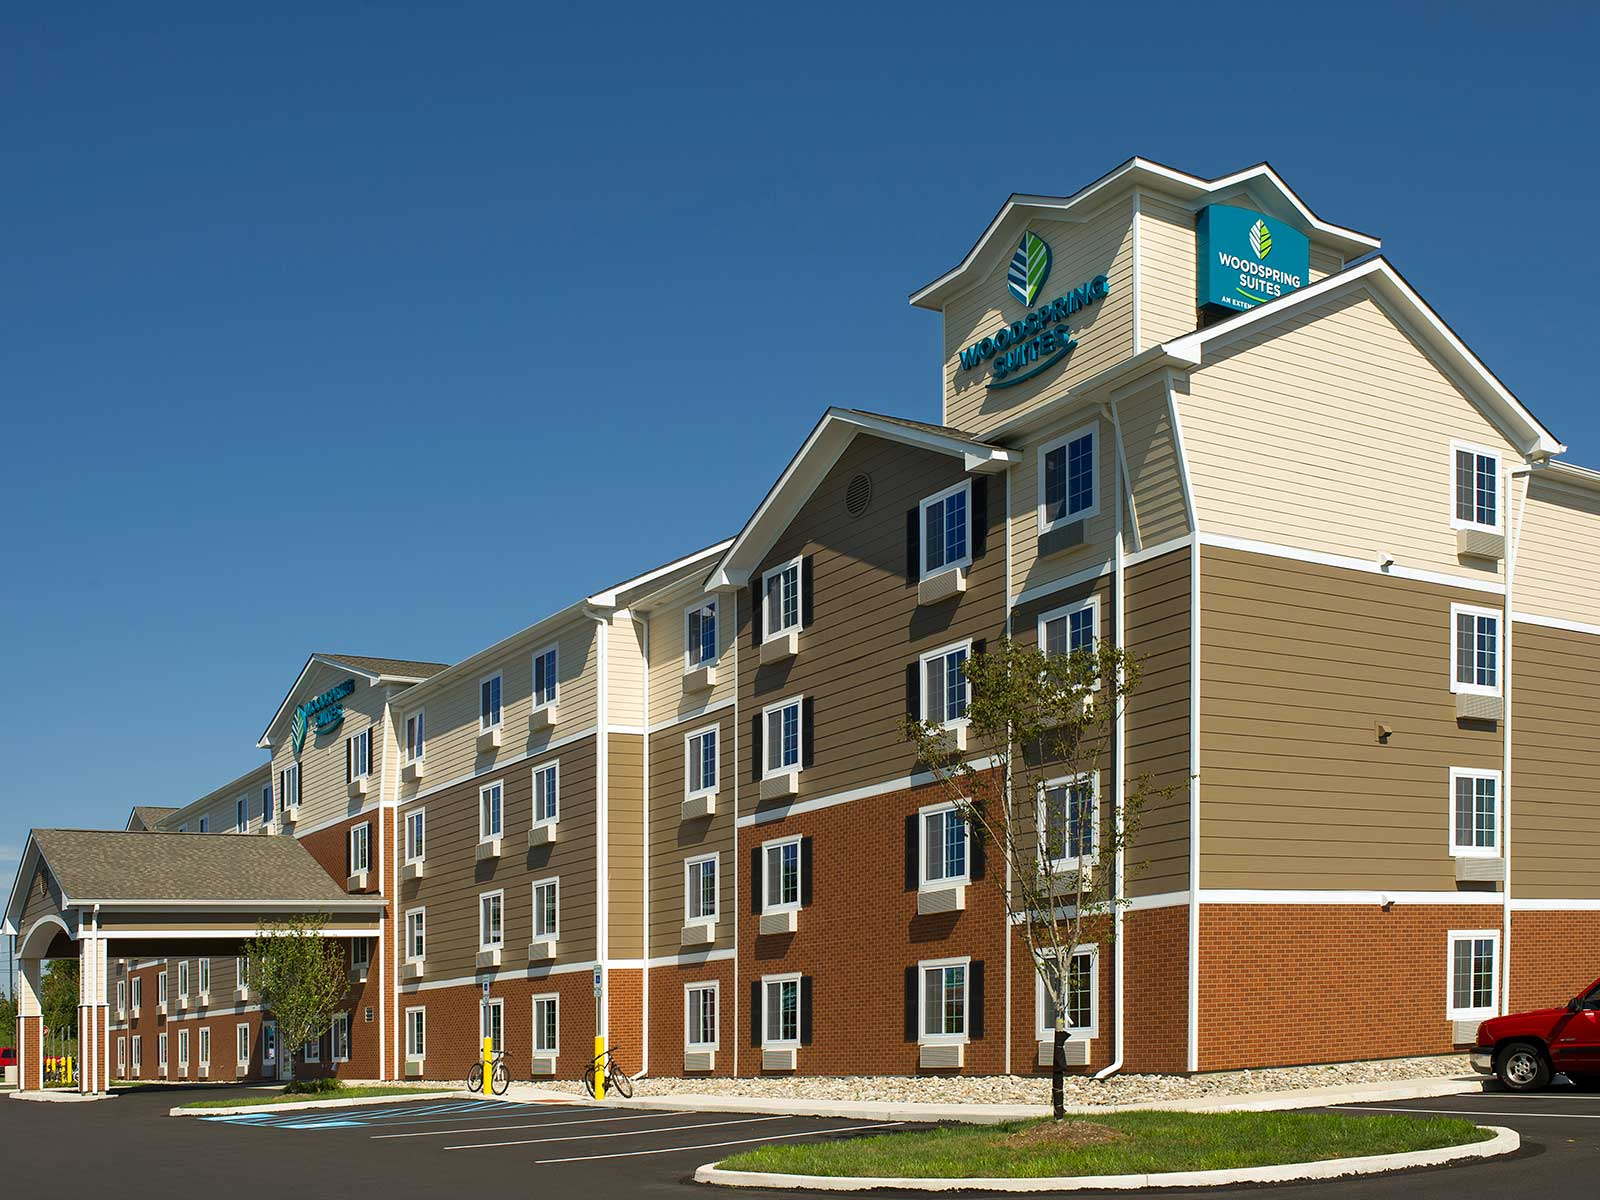 WoodSpring Suites Allentown